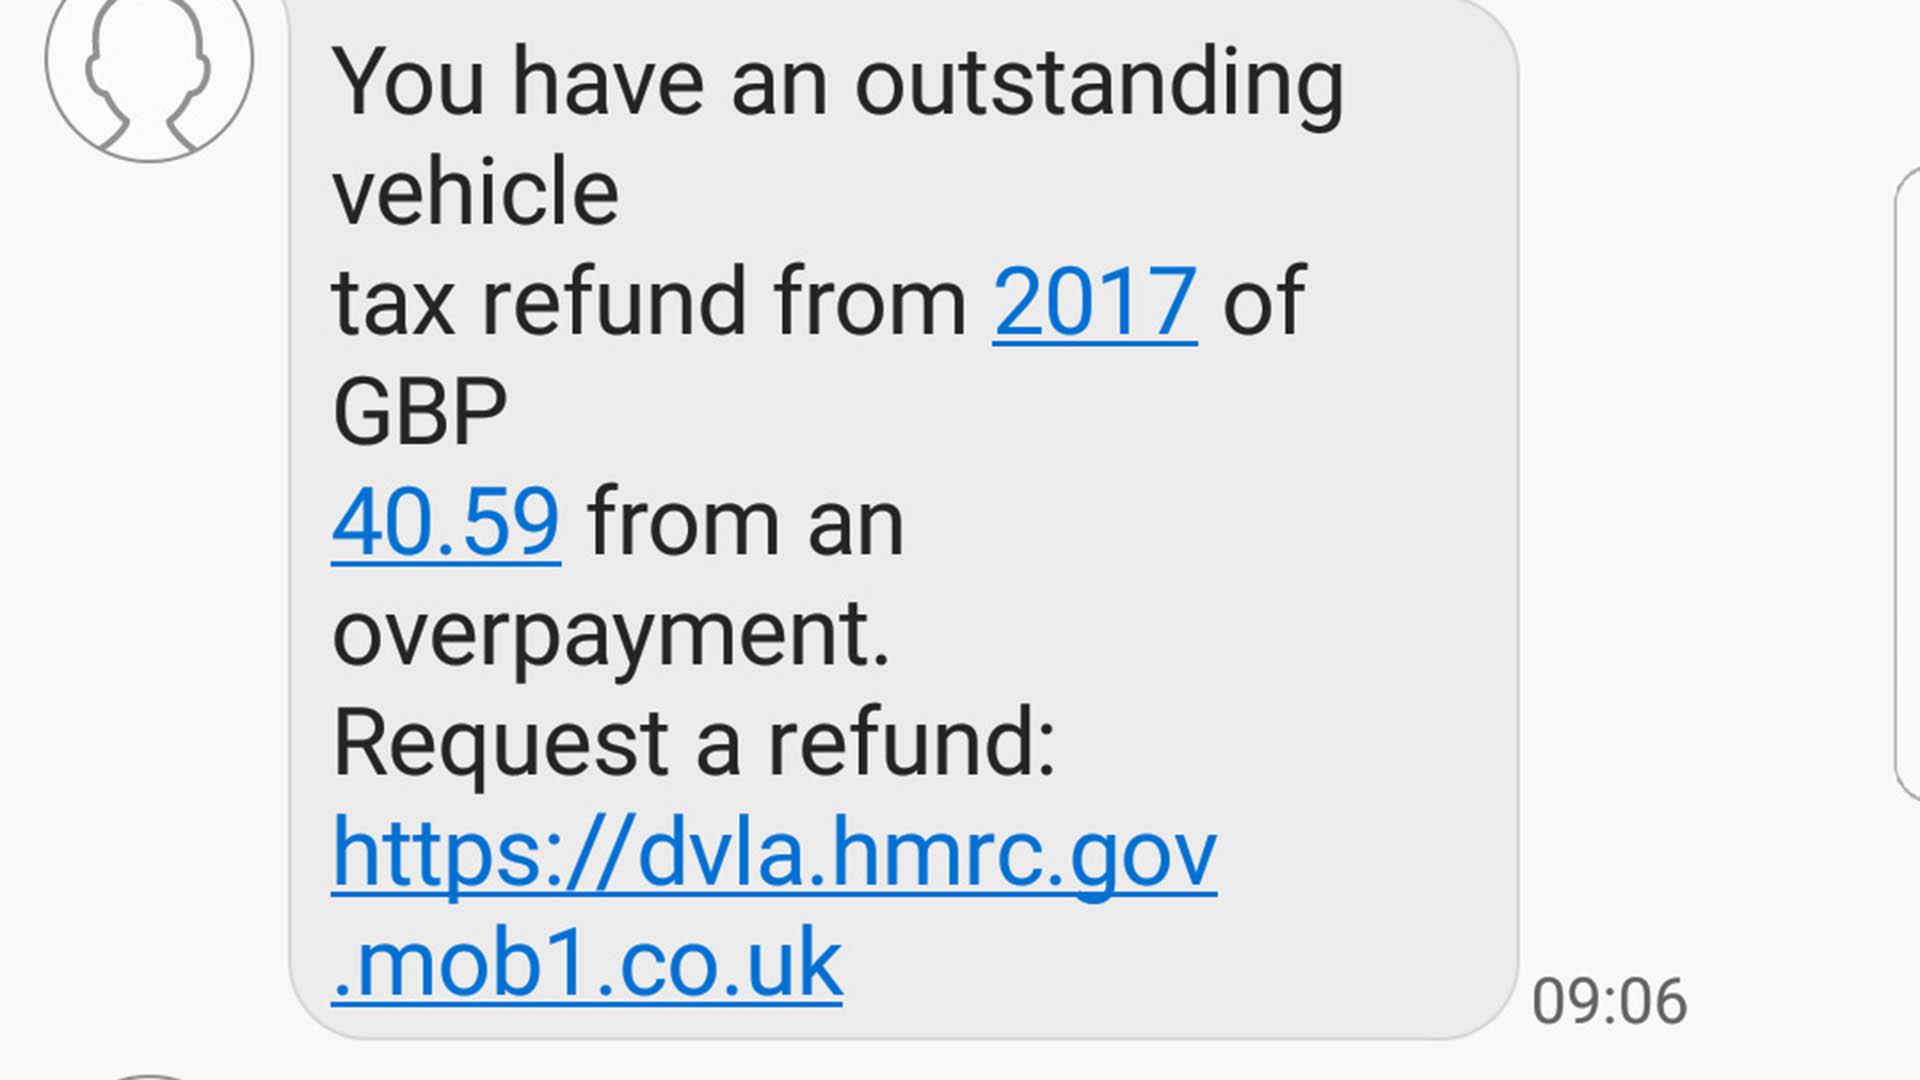 DVLA tax refund scam